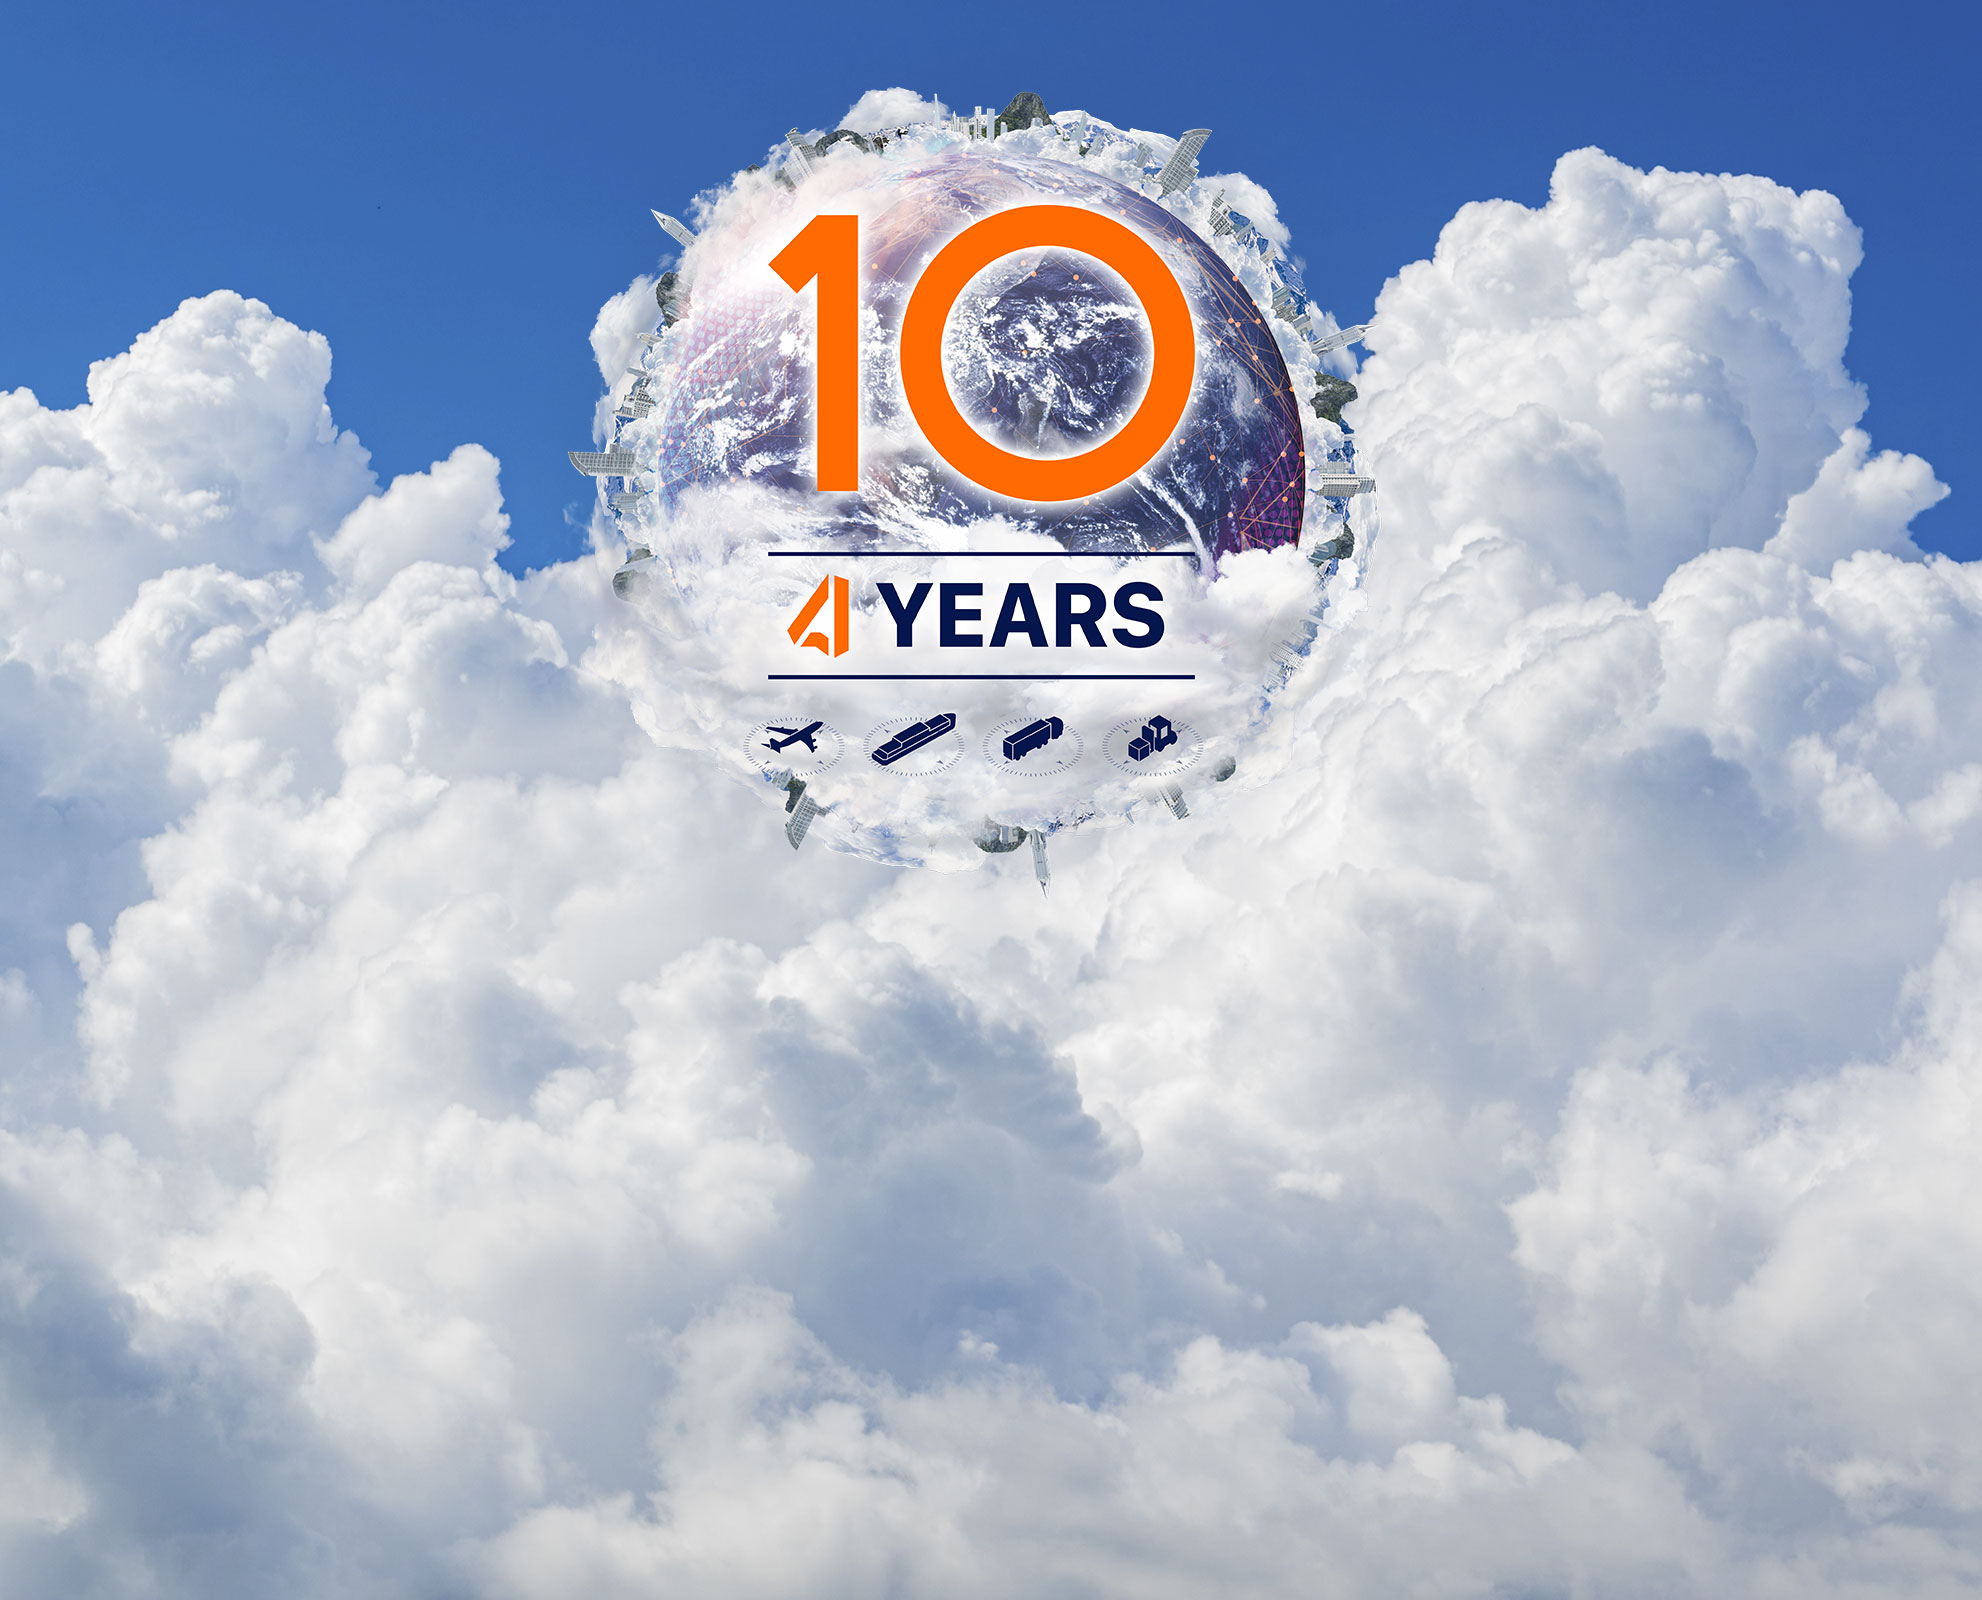 Globe in Clouds saying 10th Years